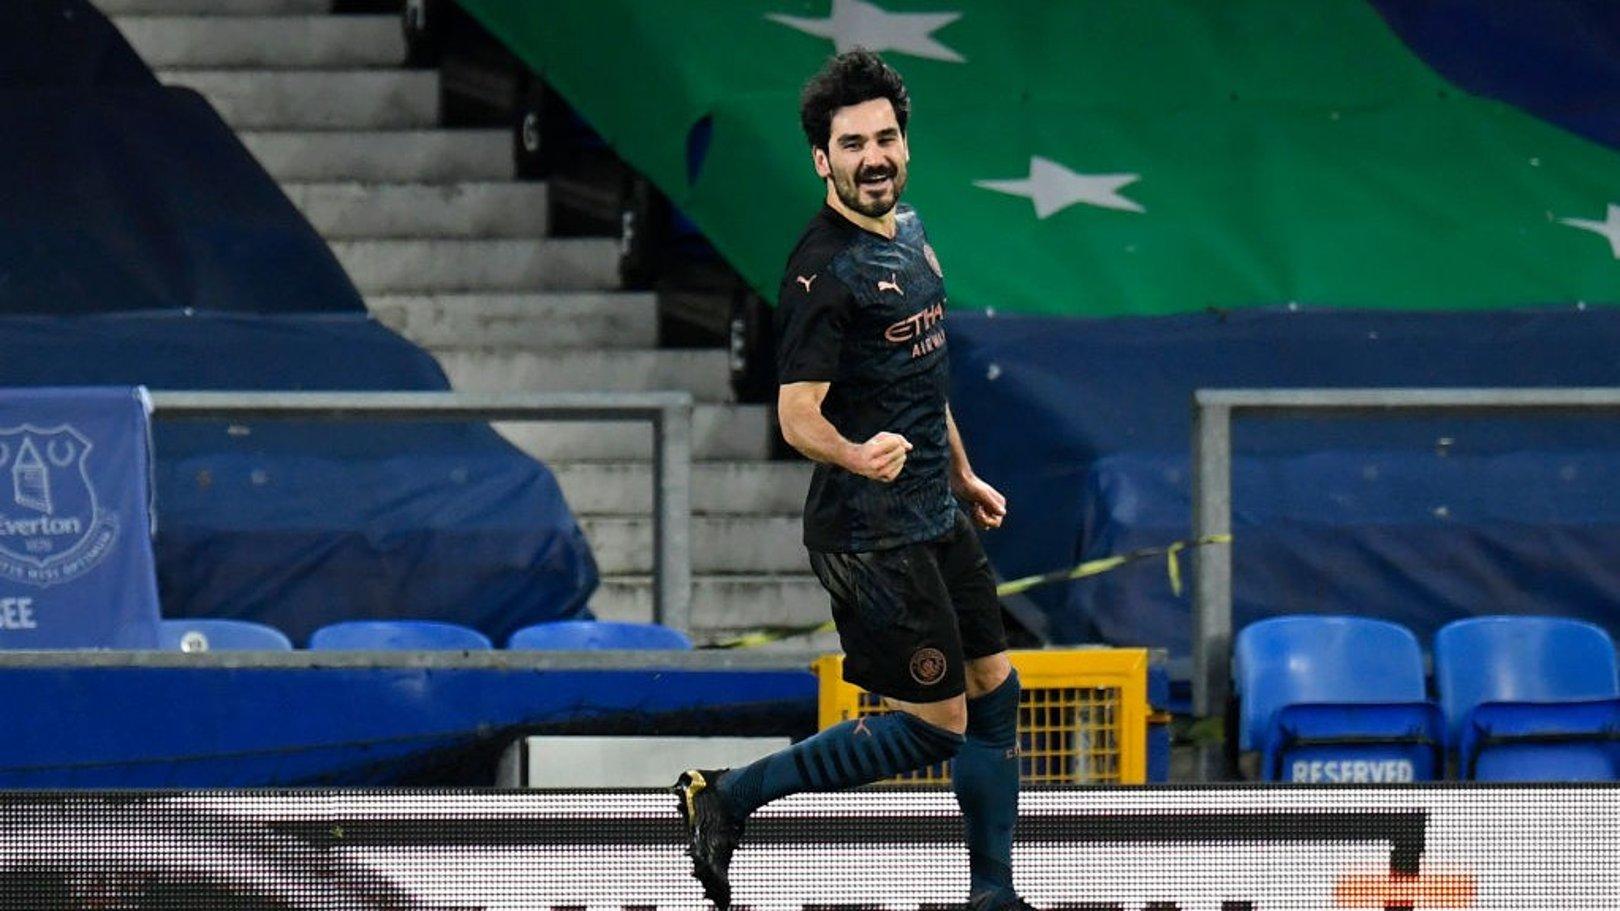 Gundogan aims for healthy return after international break ahead of season run in